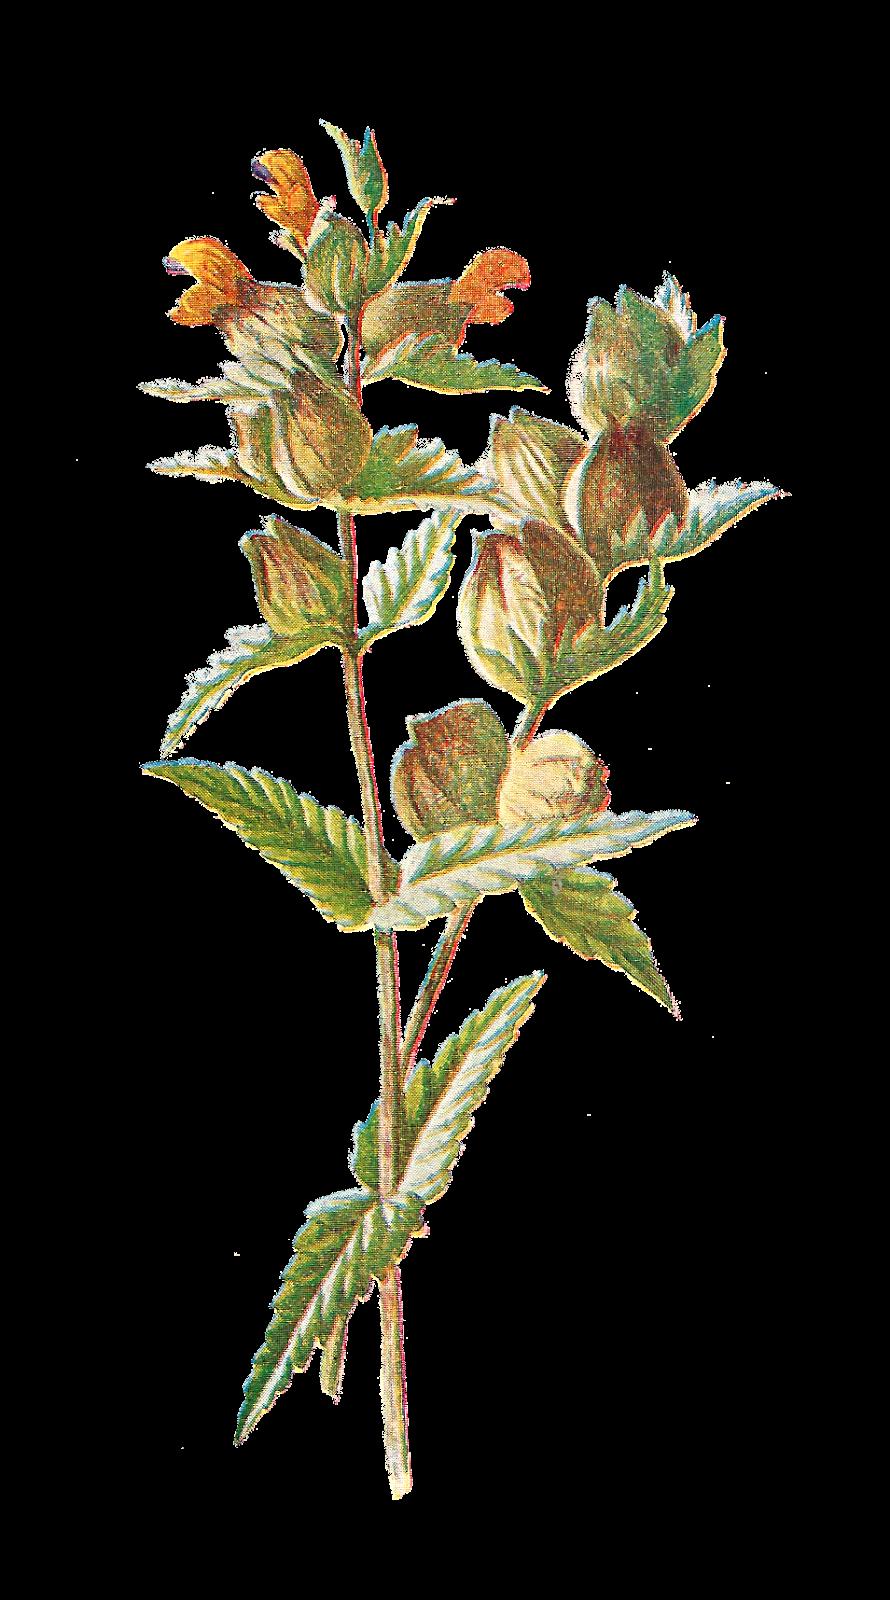 Antique images free digital. Flowers clipart illustration